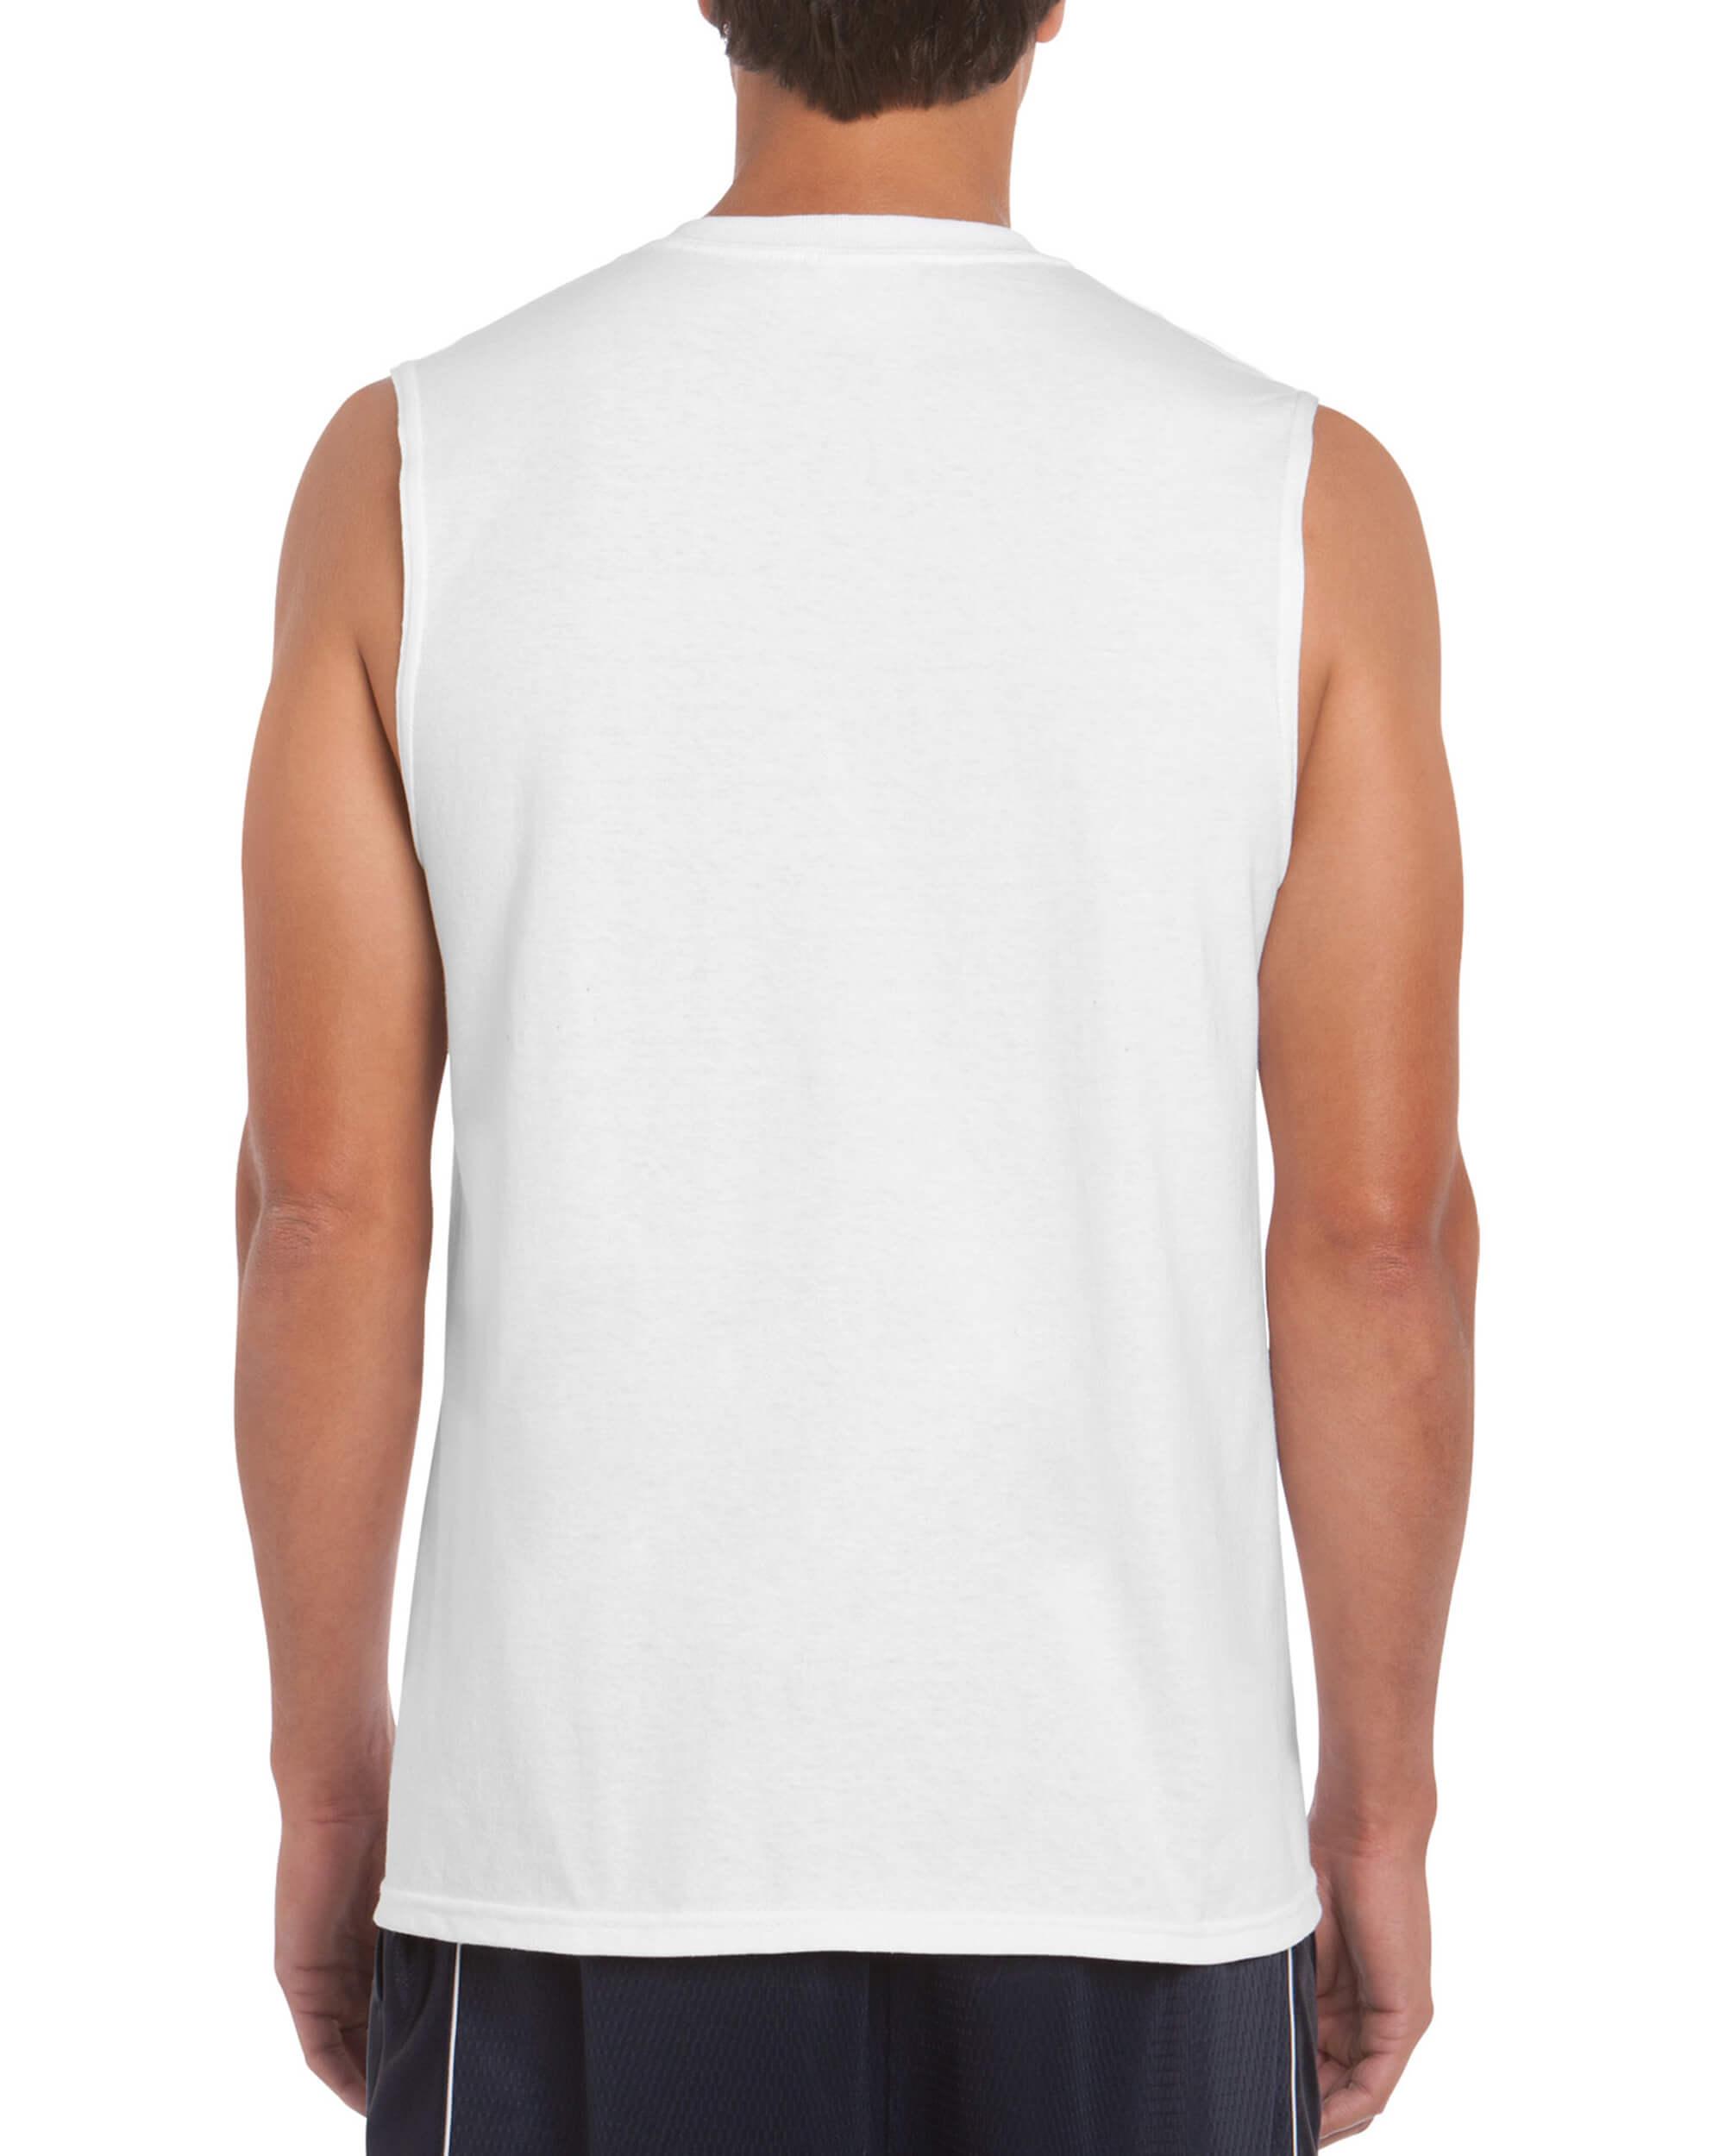 3ba2502cc White Muscle Shirt • T-Shirt Explosion